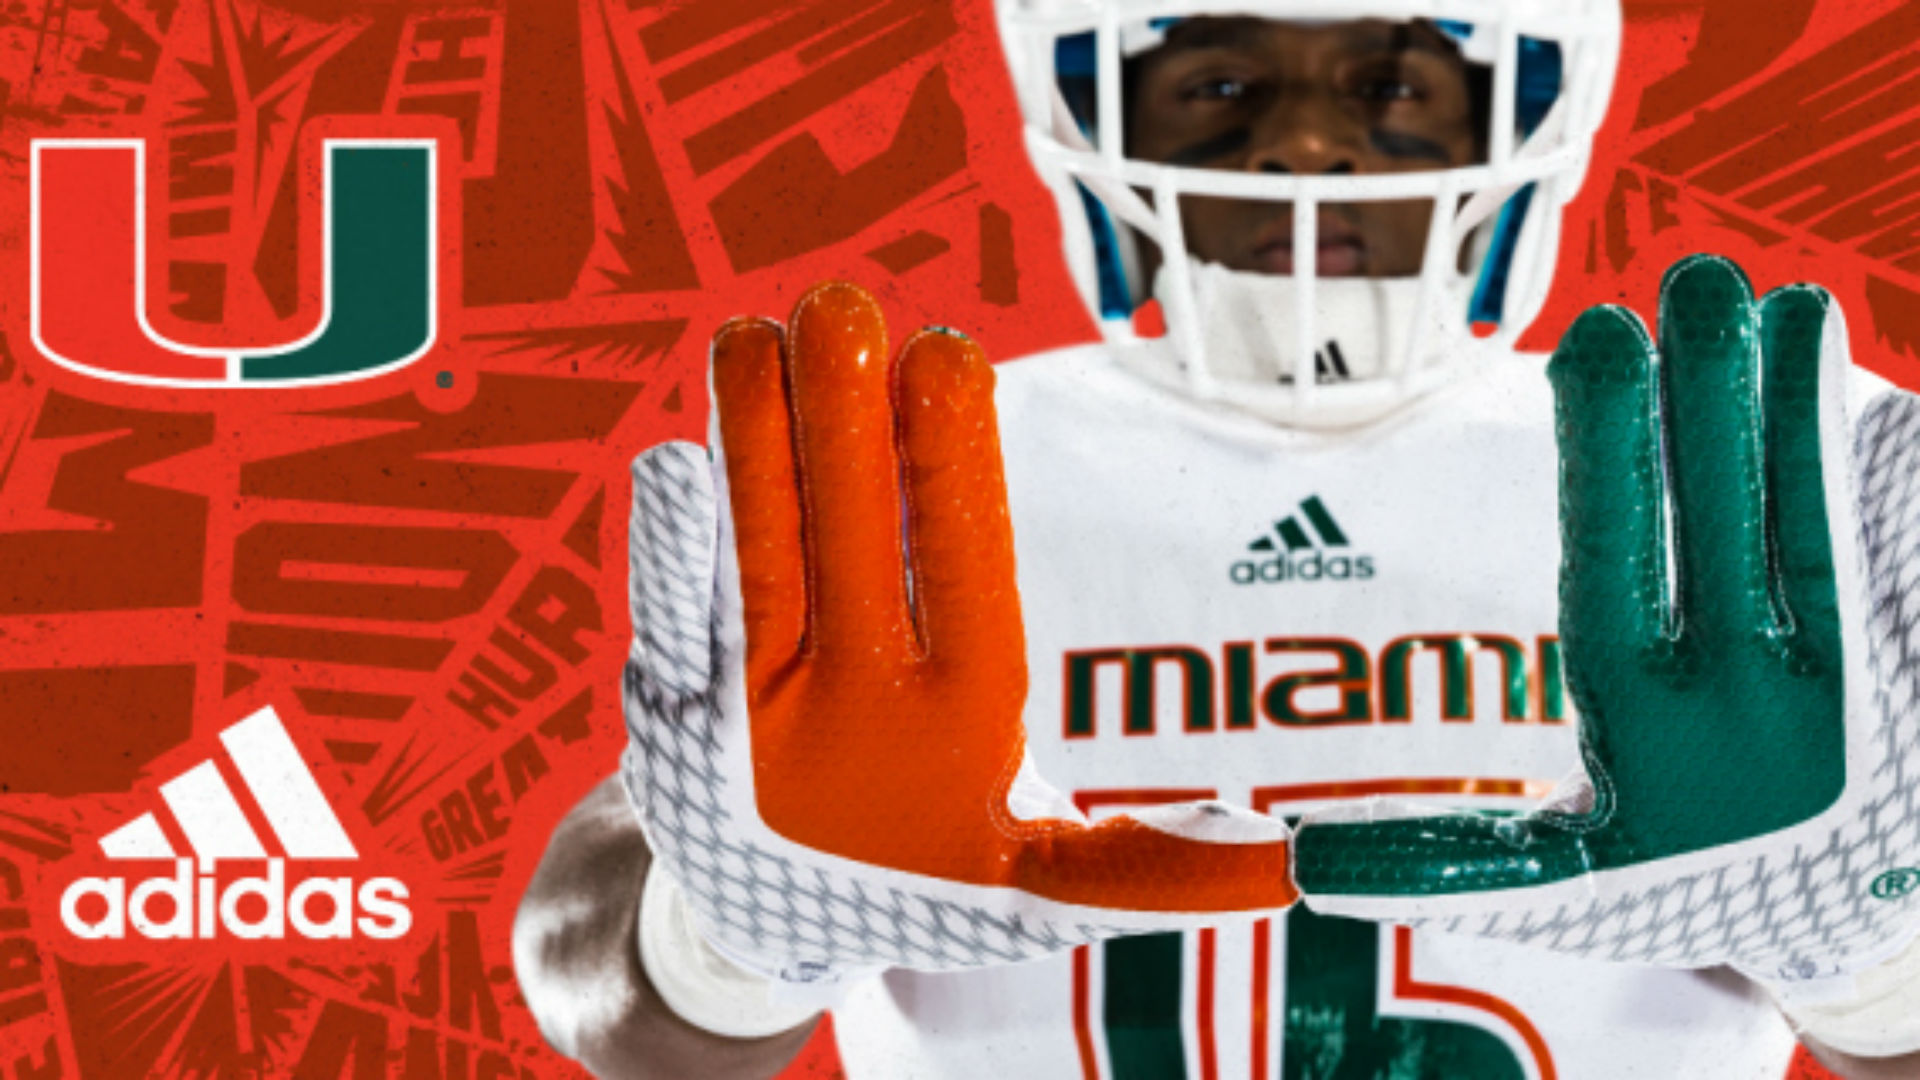 Miami Hurricanes Reveal New Adidas Uniforms In Flashy Way